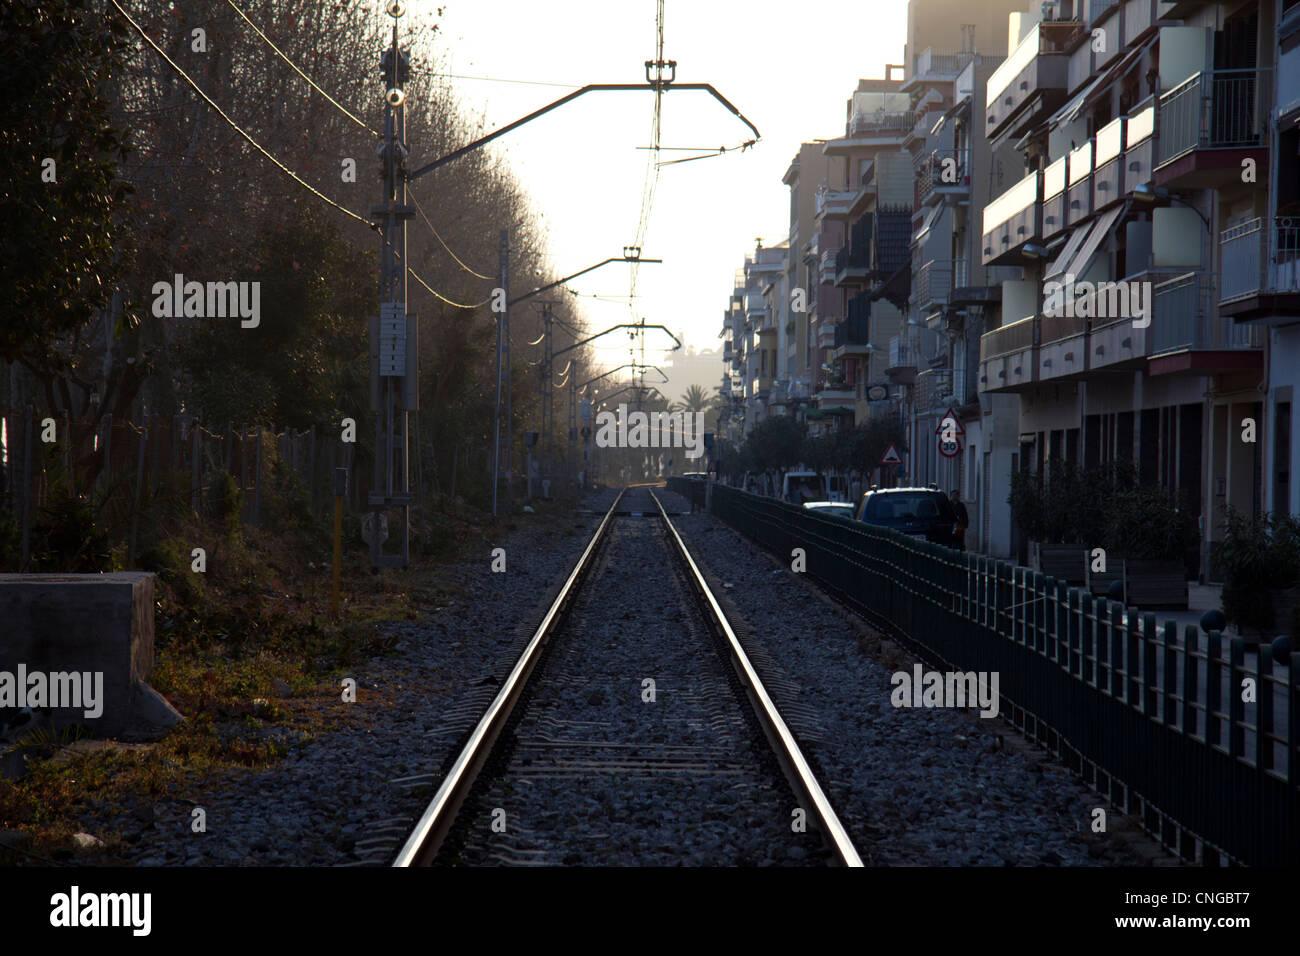 Train Lines - Stock Image